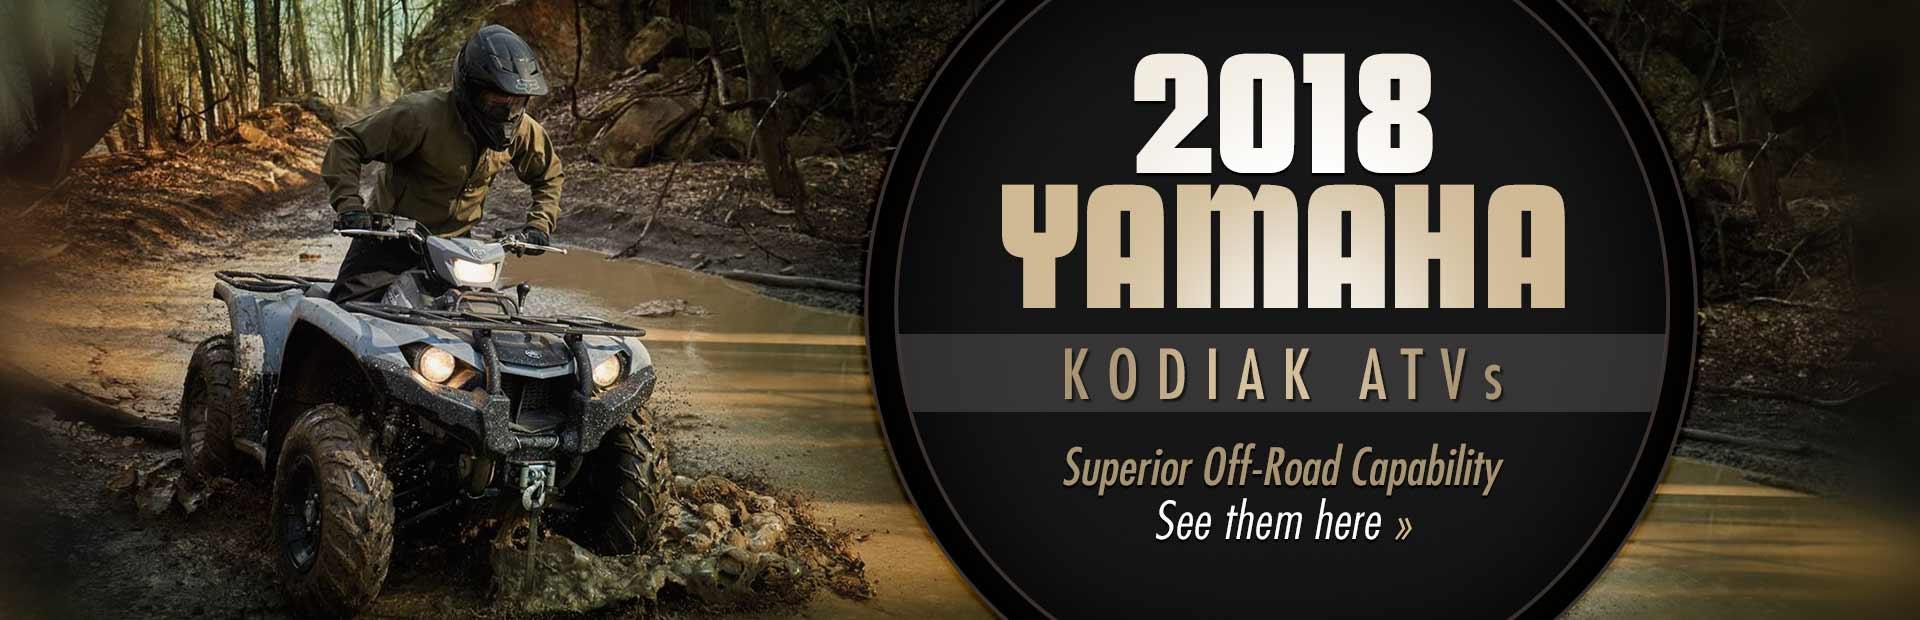 2018 Yamaha Kodiak ATVs: Click here to view the models.